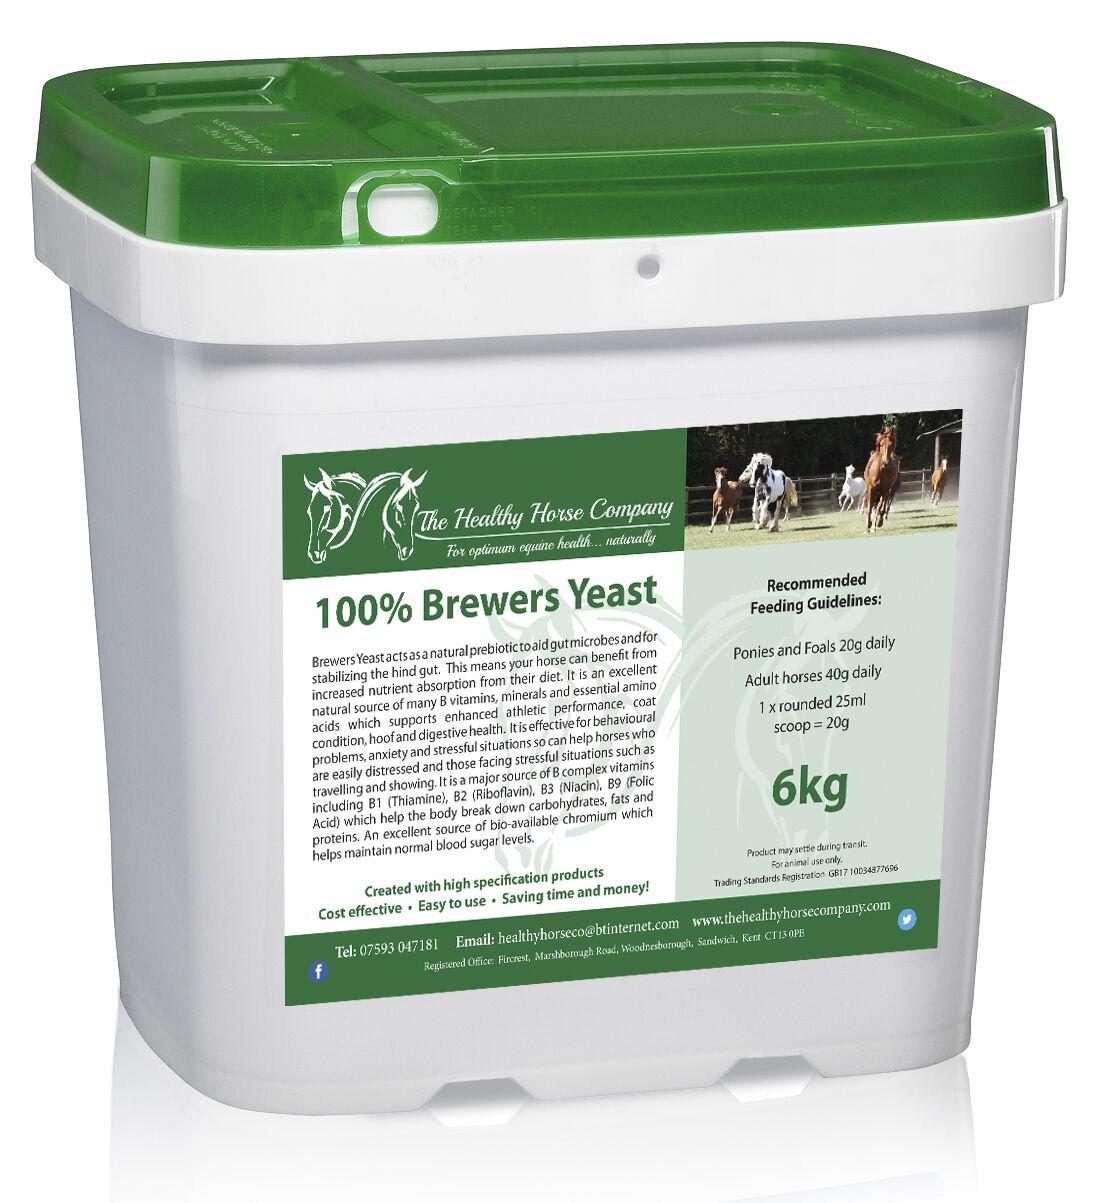 Brewers Yeast 6kg Tub (Performance, Hoof Health, B Vitamins)